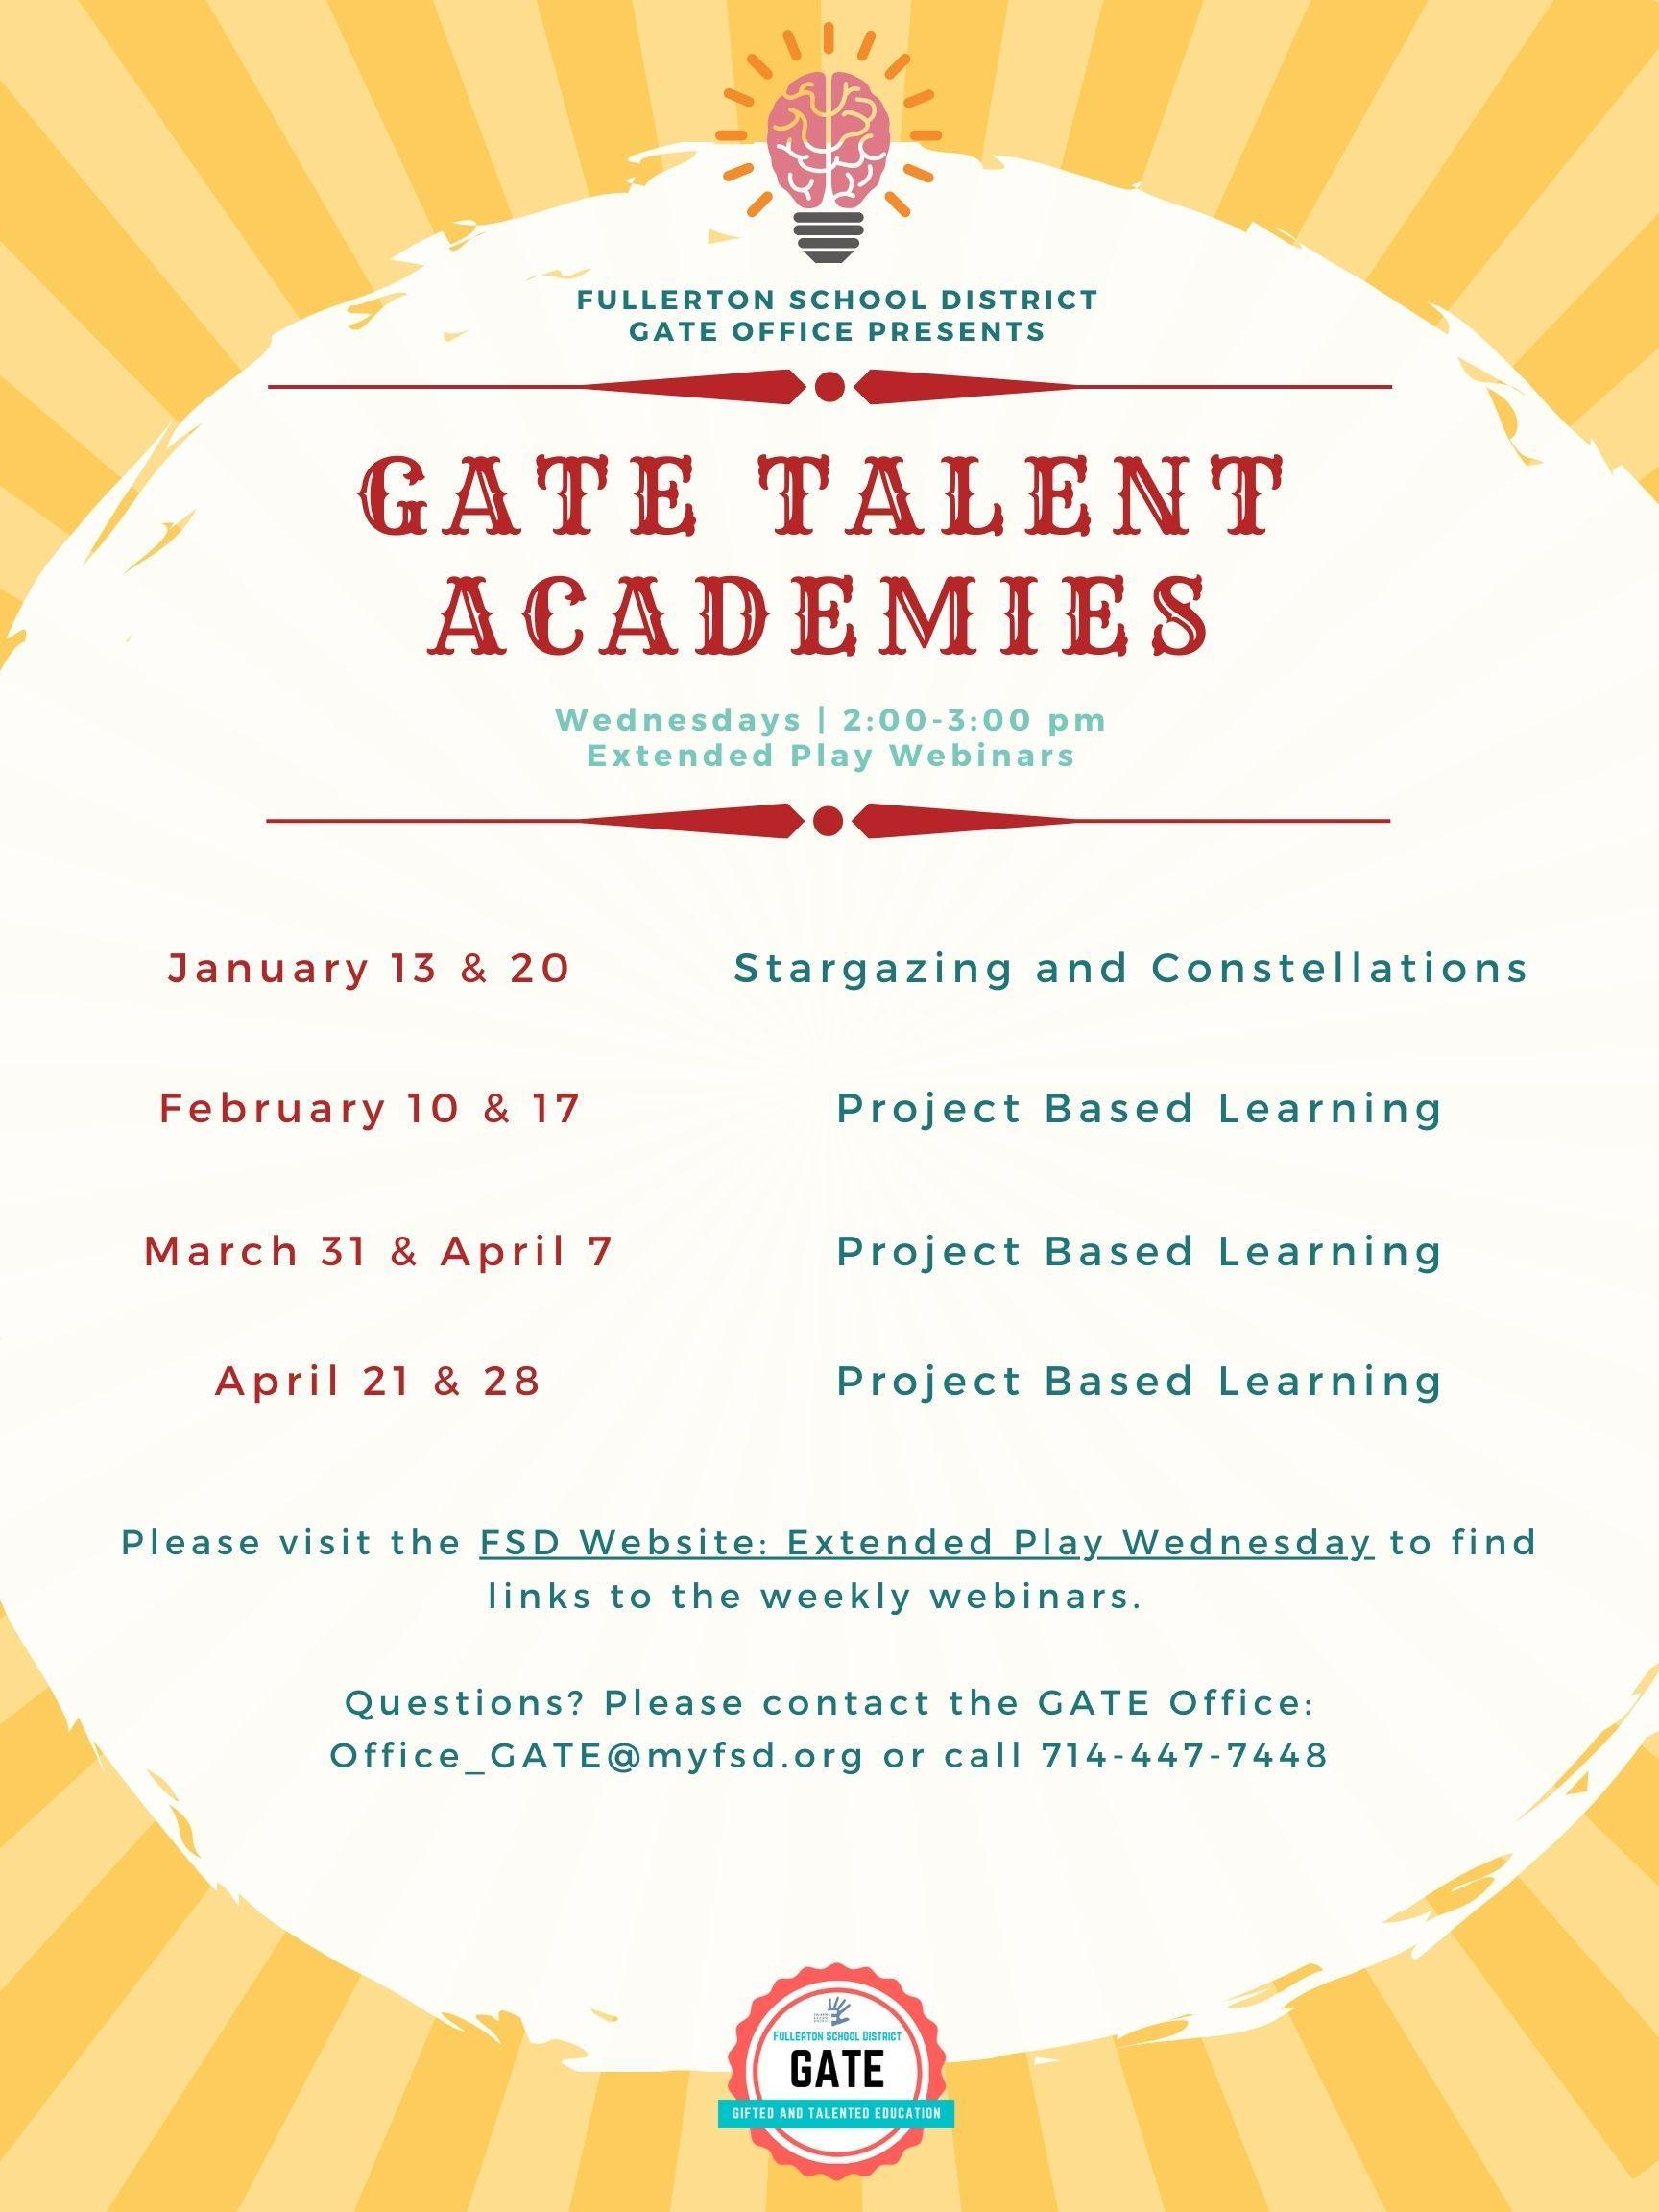 GATE Academy Flyer p2